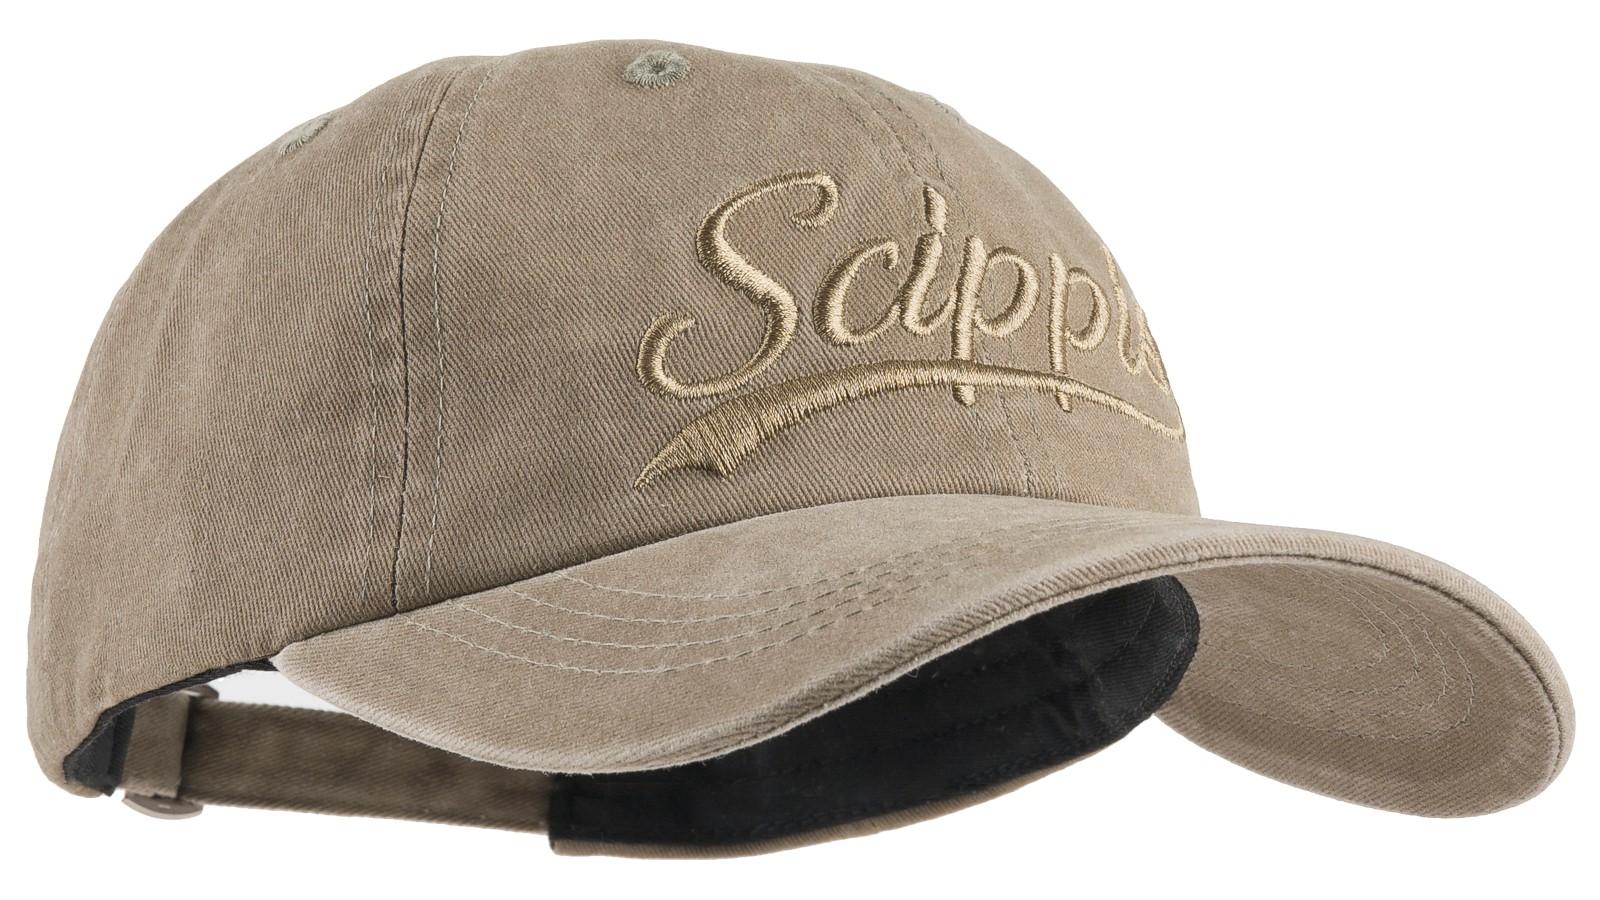 Scippis Baseball-Cap »Scippis Schriftzug« Khaki